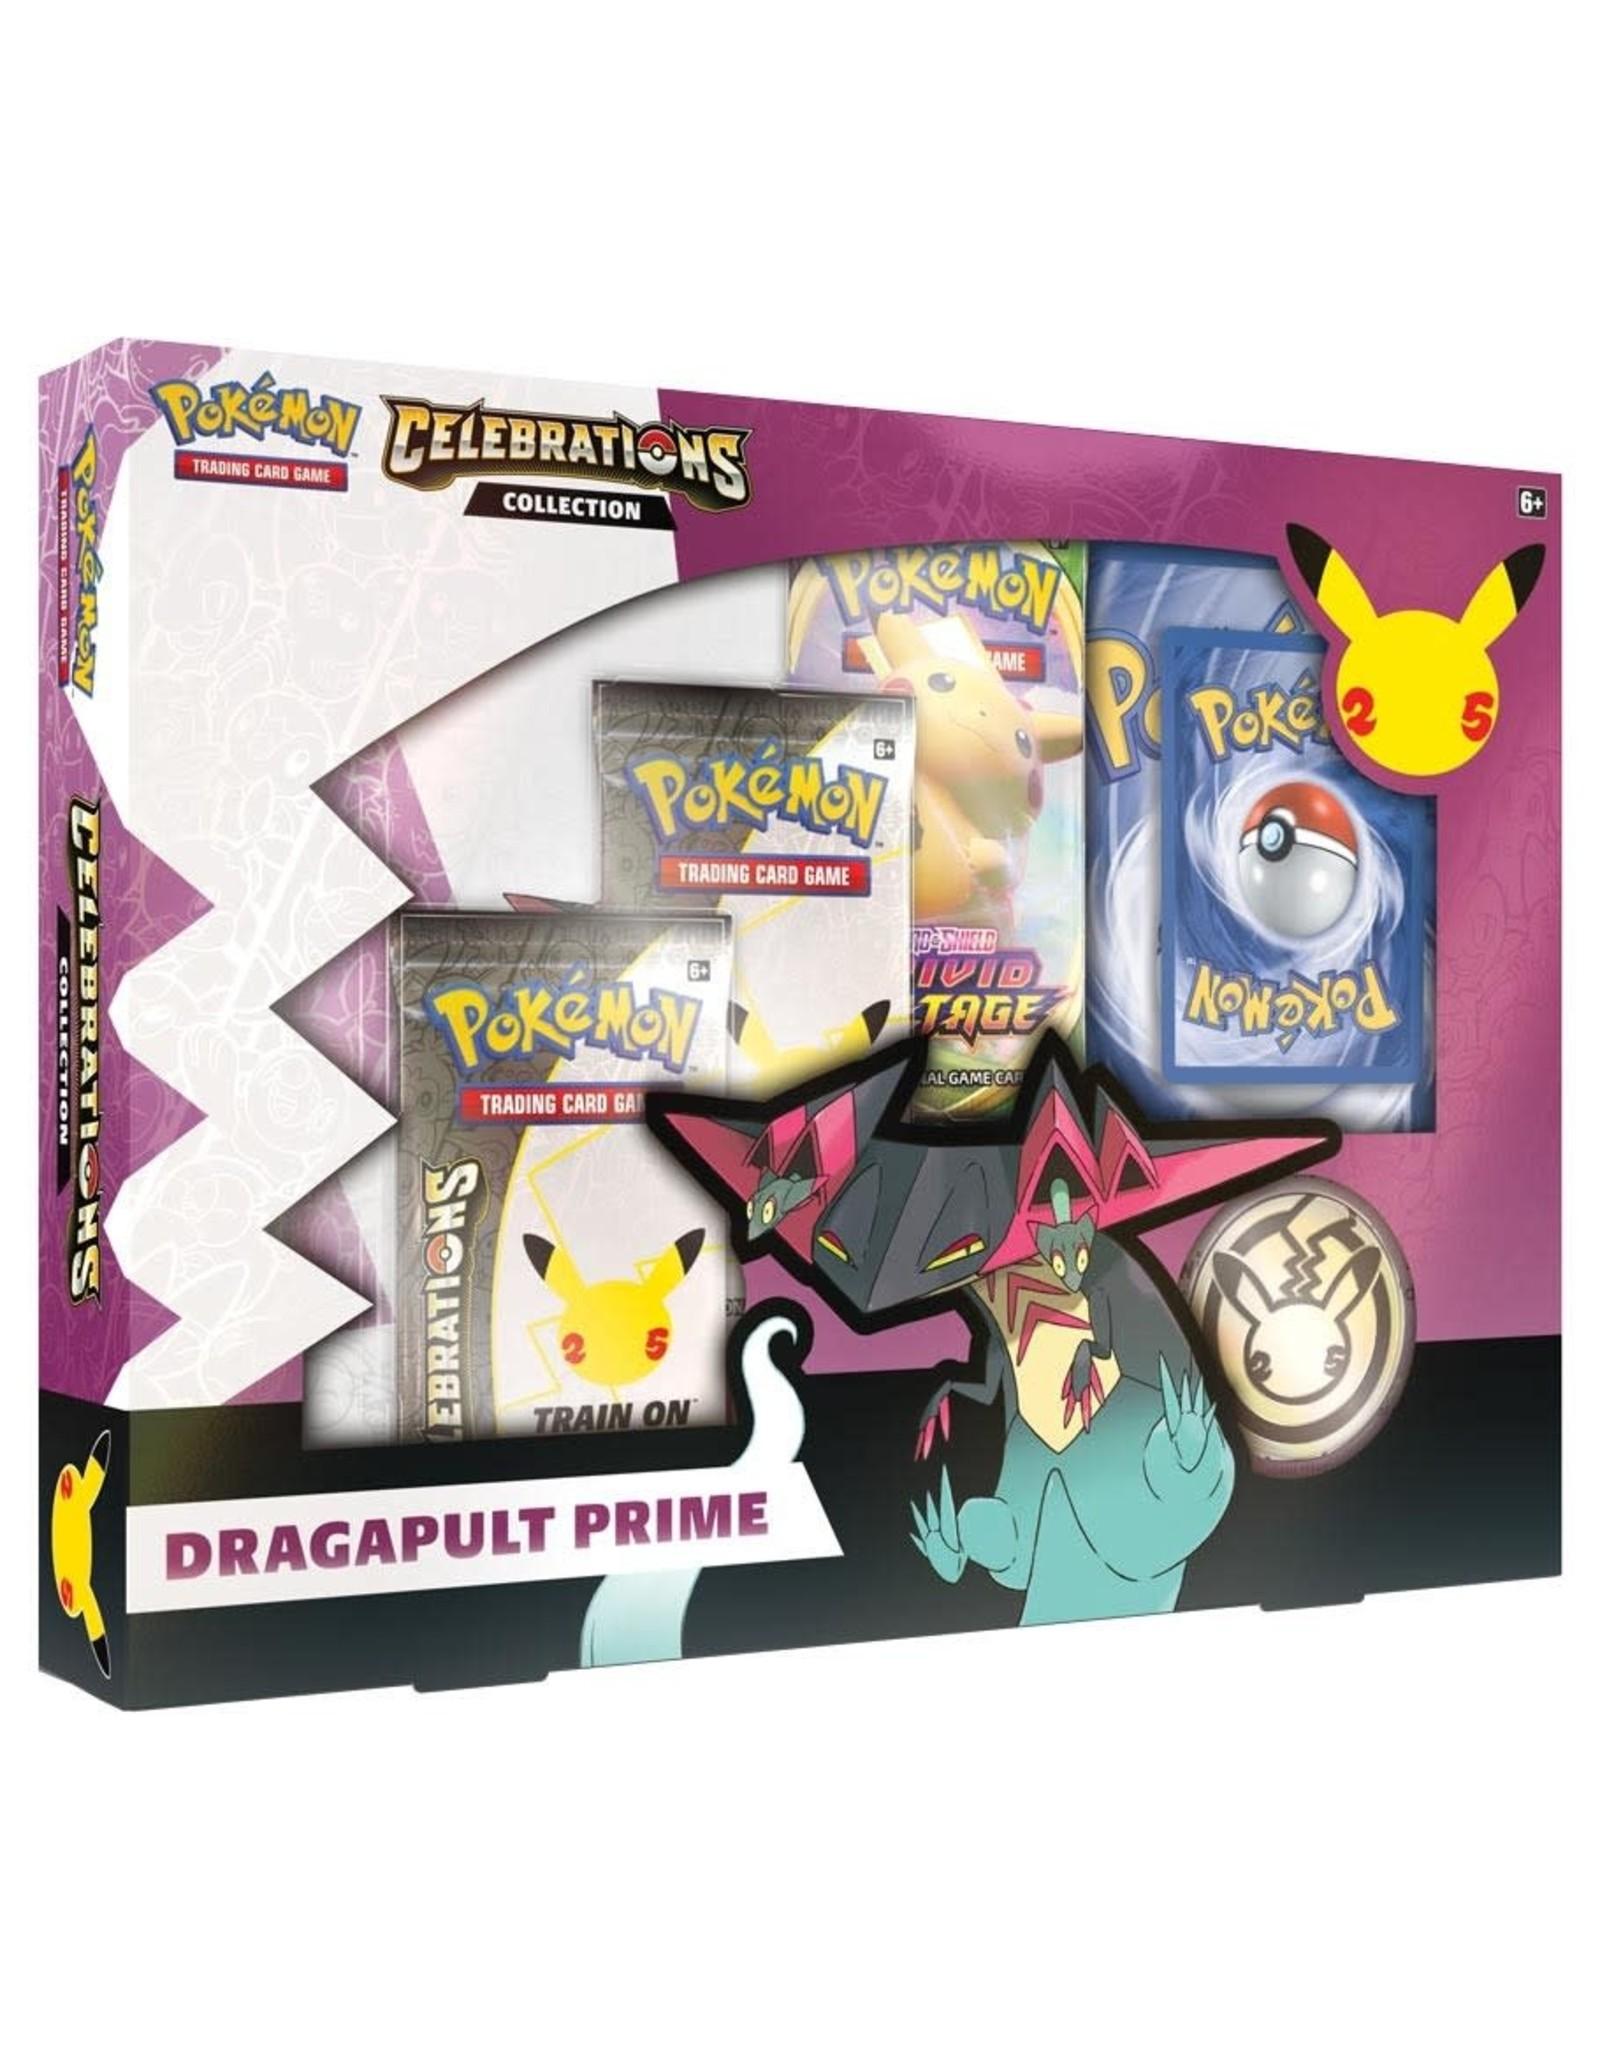 Pokemon Celebrations: Dragapult Prime - PREORDER, AVAILABLE OCT 8